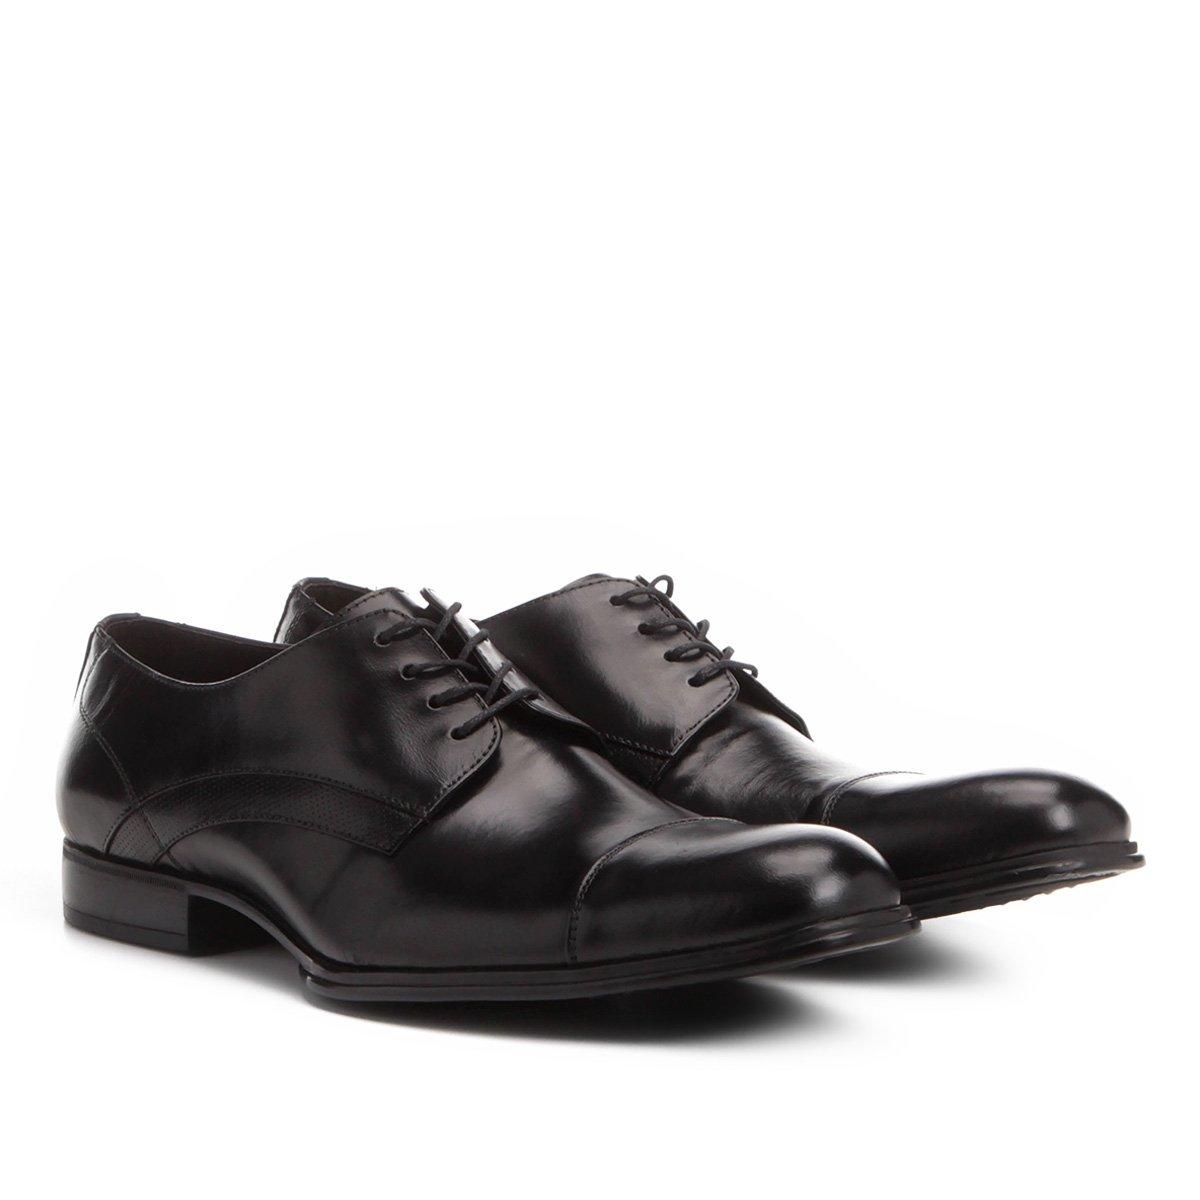 402011fb4 Sapato Social Couro Shoestock Revere